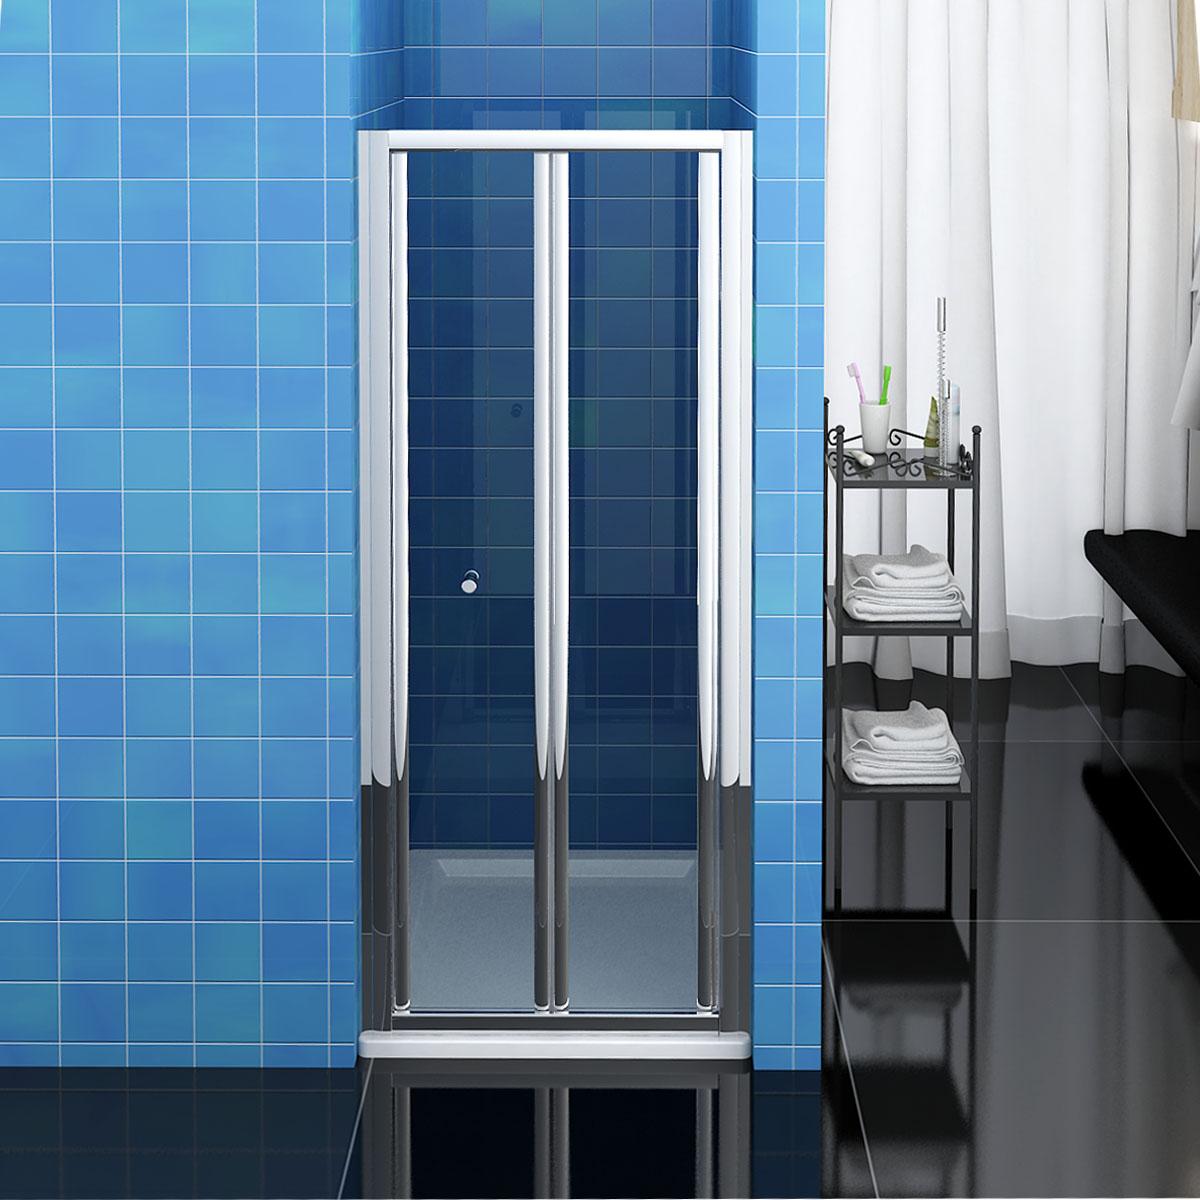 Bathroom bi fold shower door 900mm enclosure cubicle glass for Bi fold screen doors